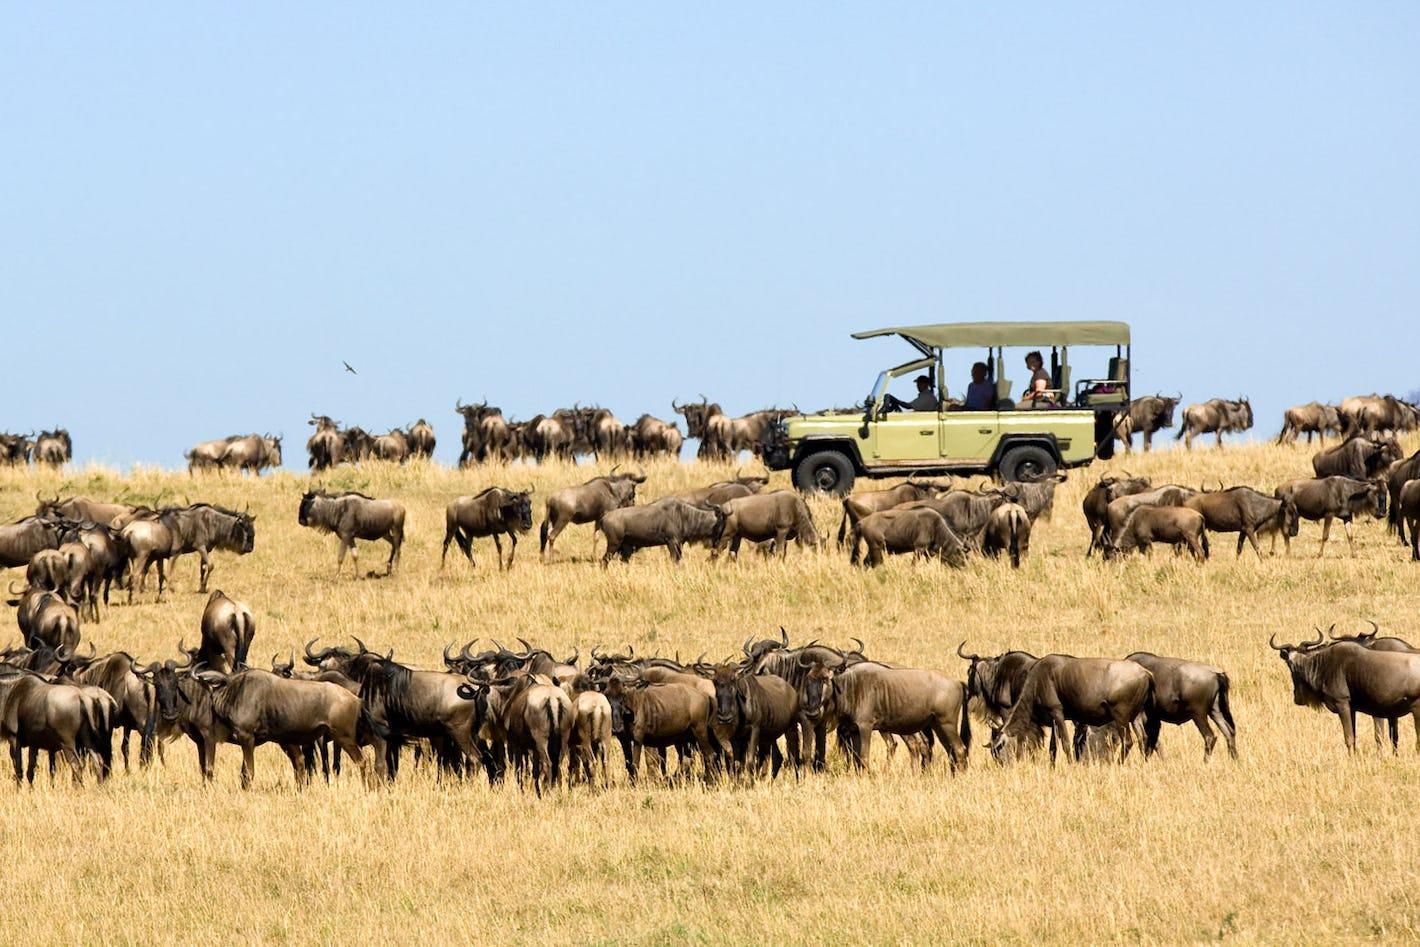 Safari Tour From Nairobi To Uganda